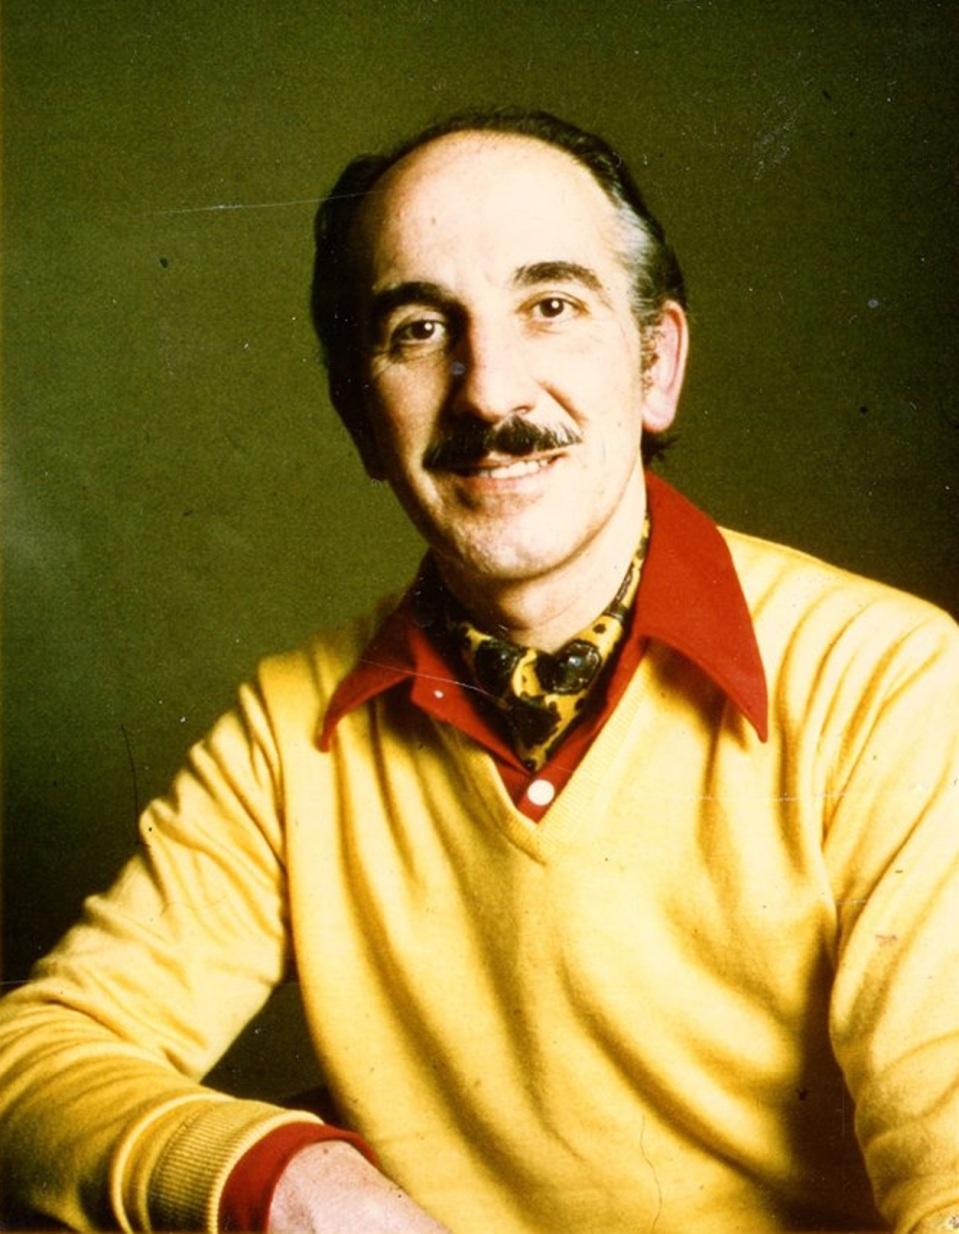 Ugo Ruggeri